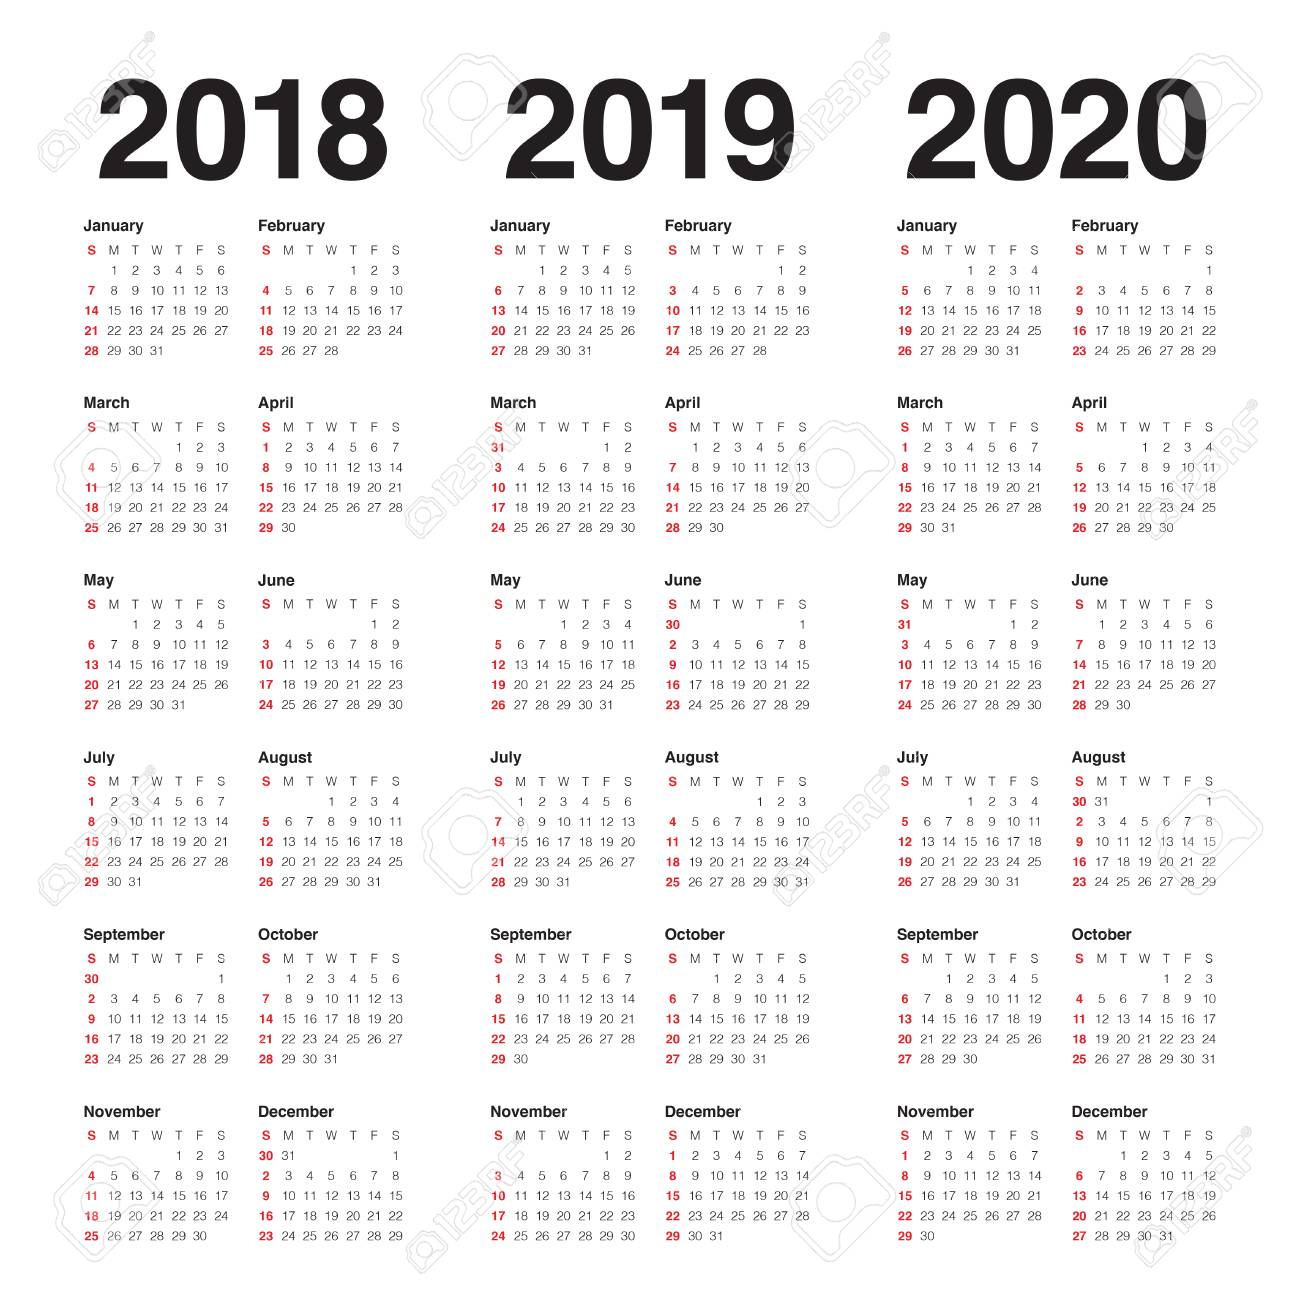 Year 2018 2019 2020 Calendar Vector Design Template, Simple And.. with regard to 3 Year Calendar Printable 2018 2019 2020